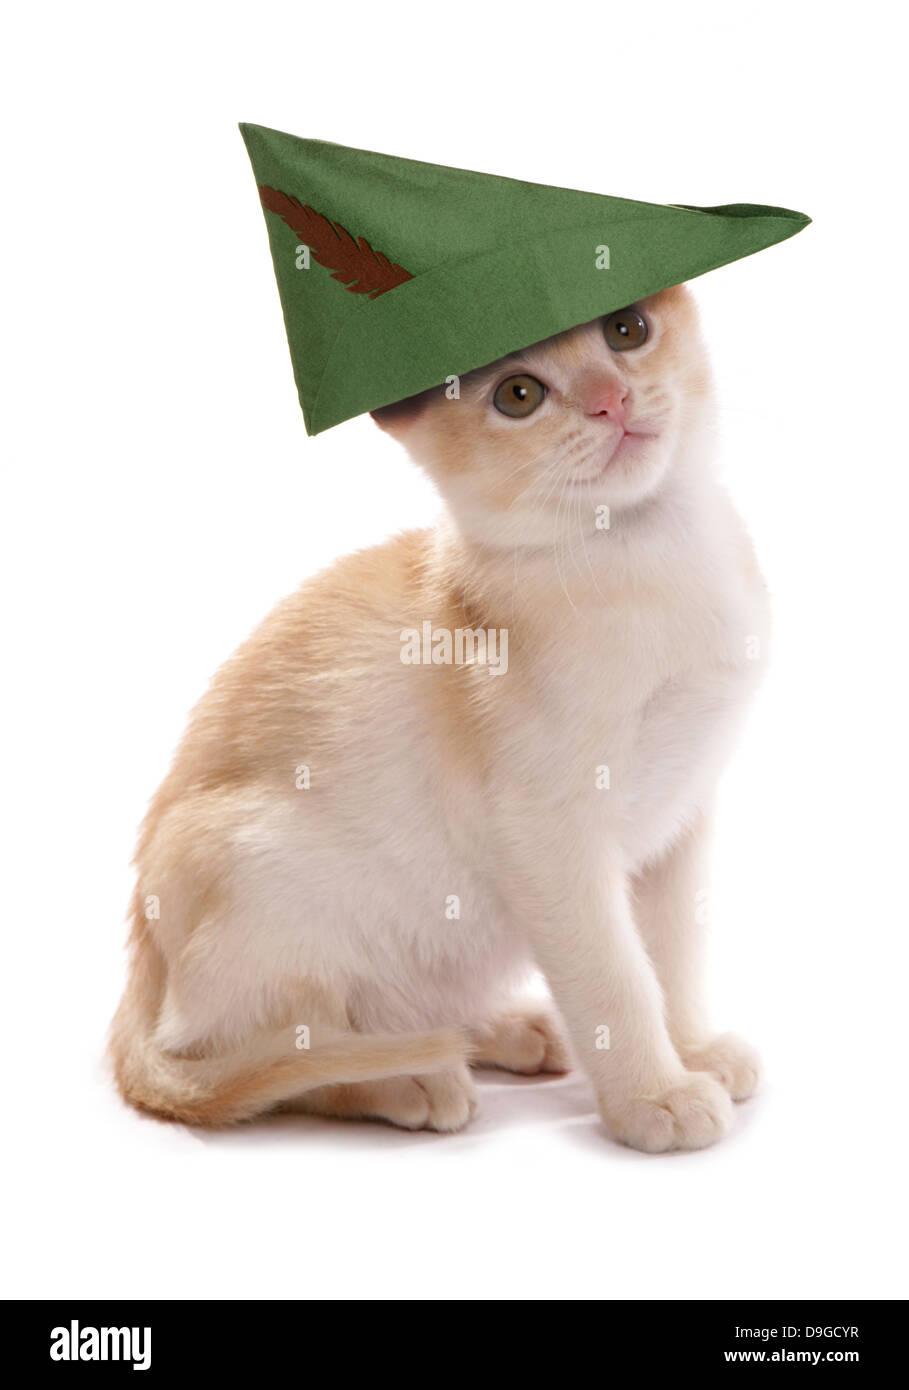 robin hood kitten - Stock Image